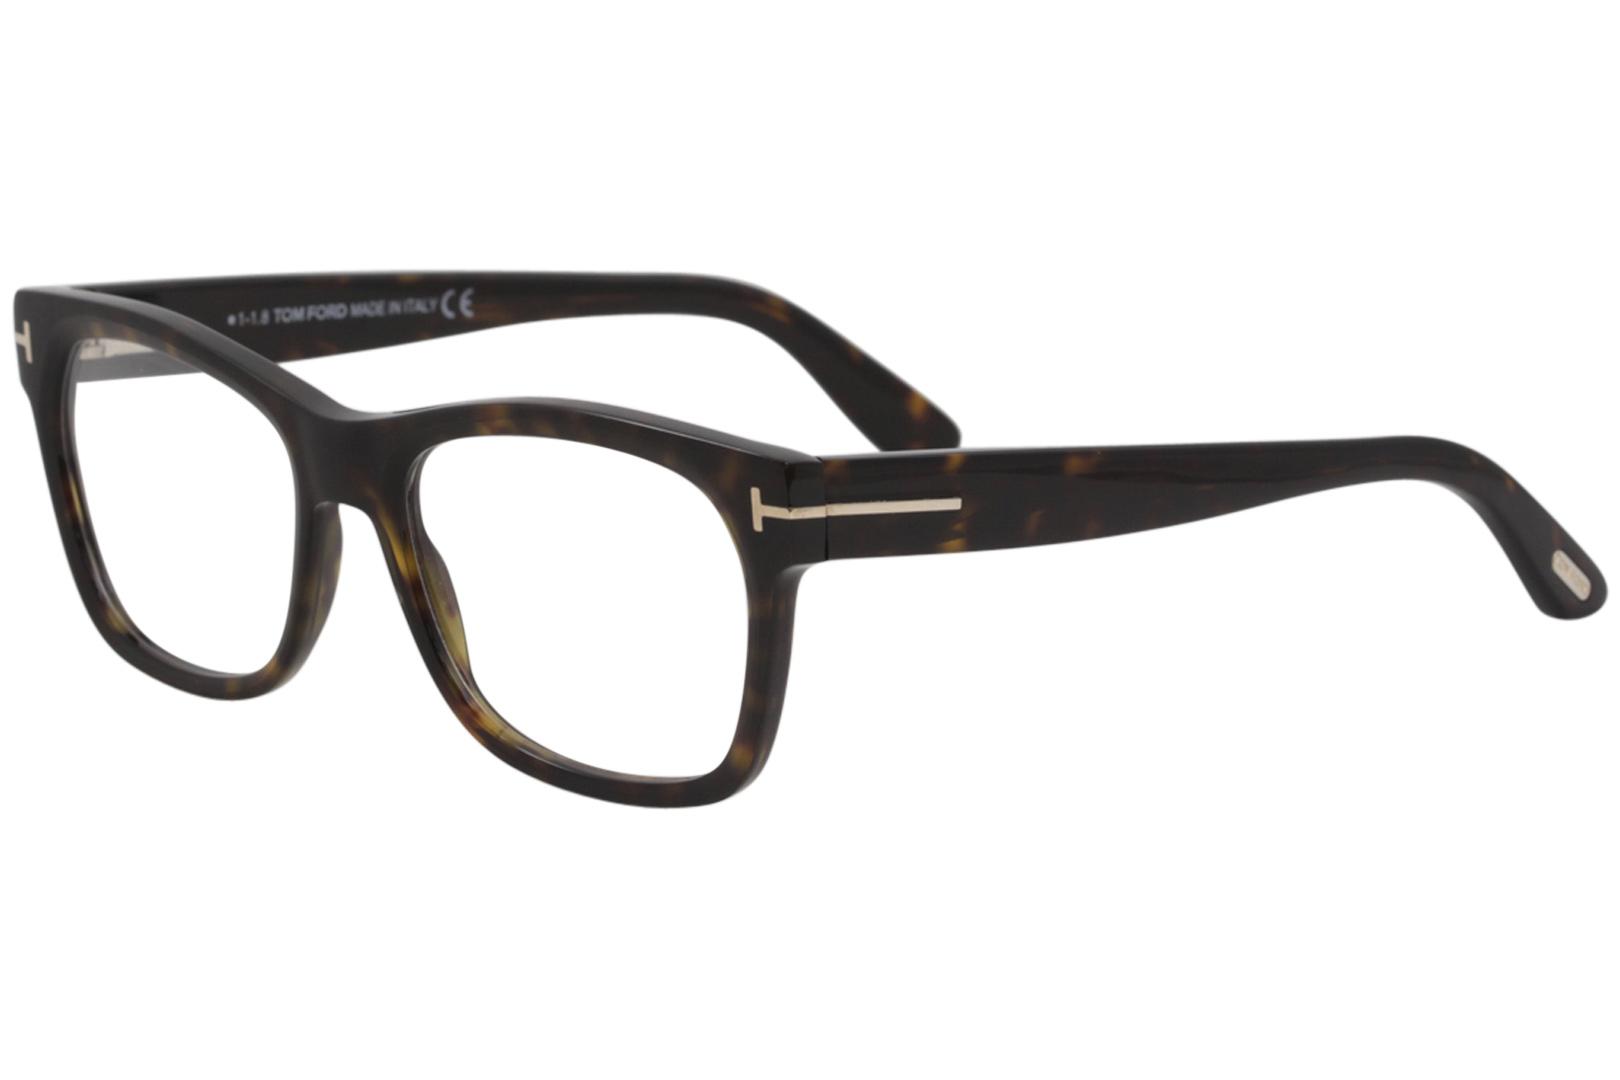 d9a0bf6137d Tom Ford Men s Eyeglasses TF5468 TF 5468 052 Dark Havana Optical ...